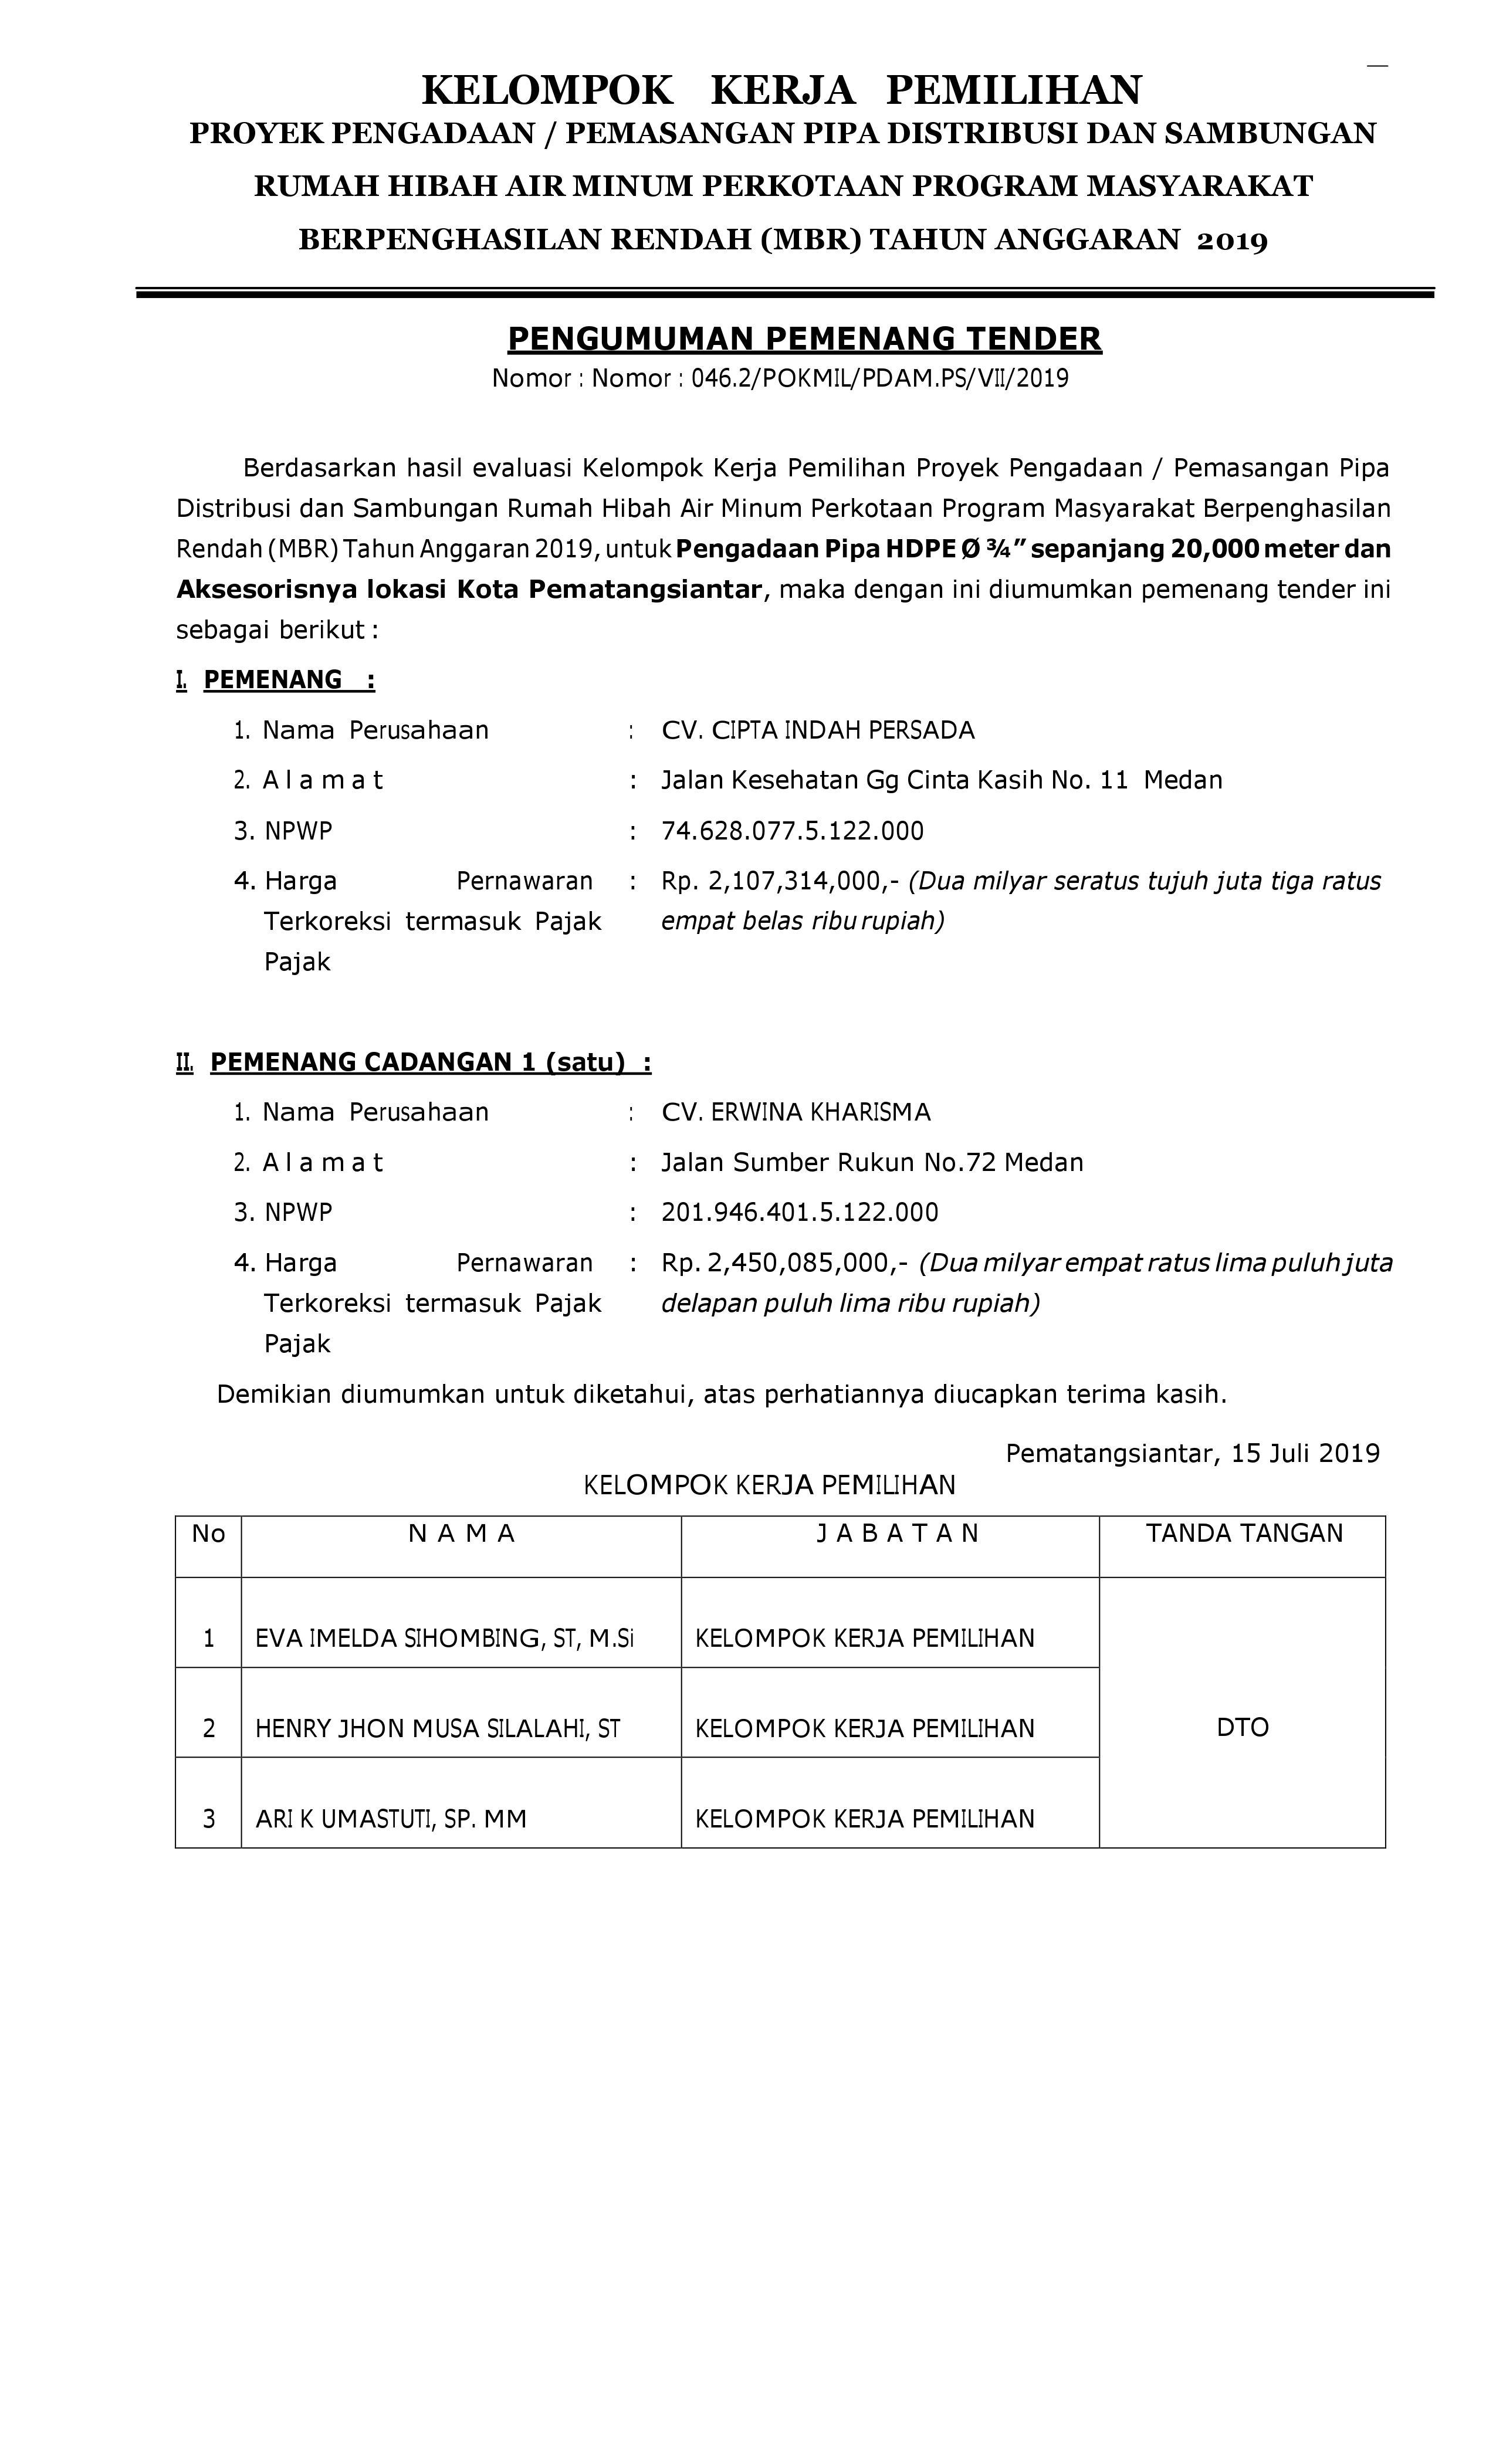 PENGUMUMAN PEMENANG TENDER PROGRAM HIBAH AIR MINUM (MBR) PDAM TIRTAULI TA.2019 PENGADAAN PIPA HDPE